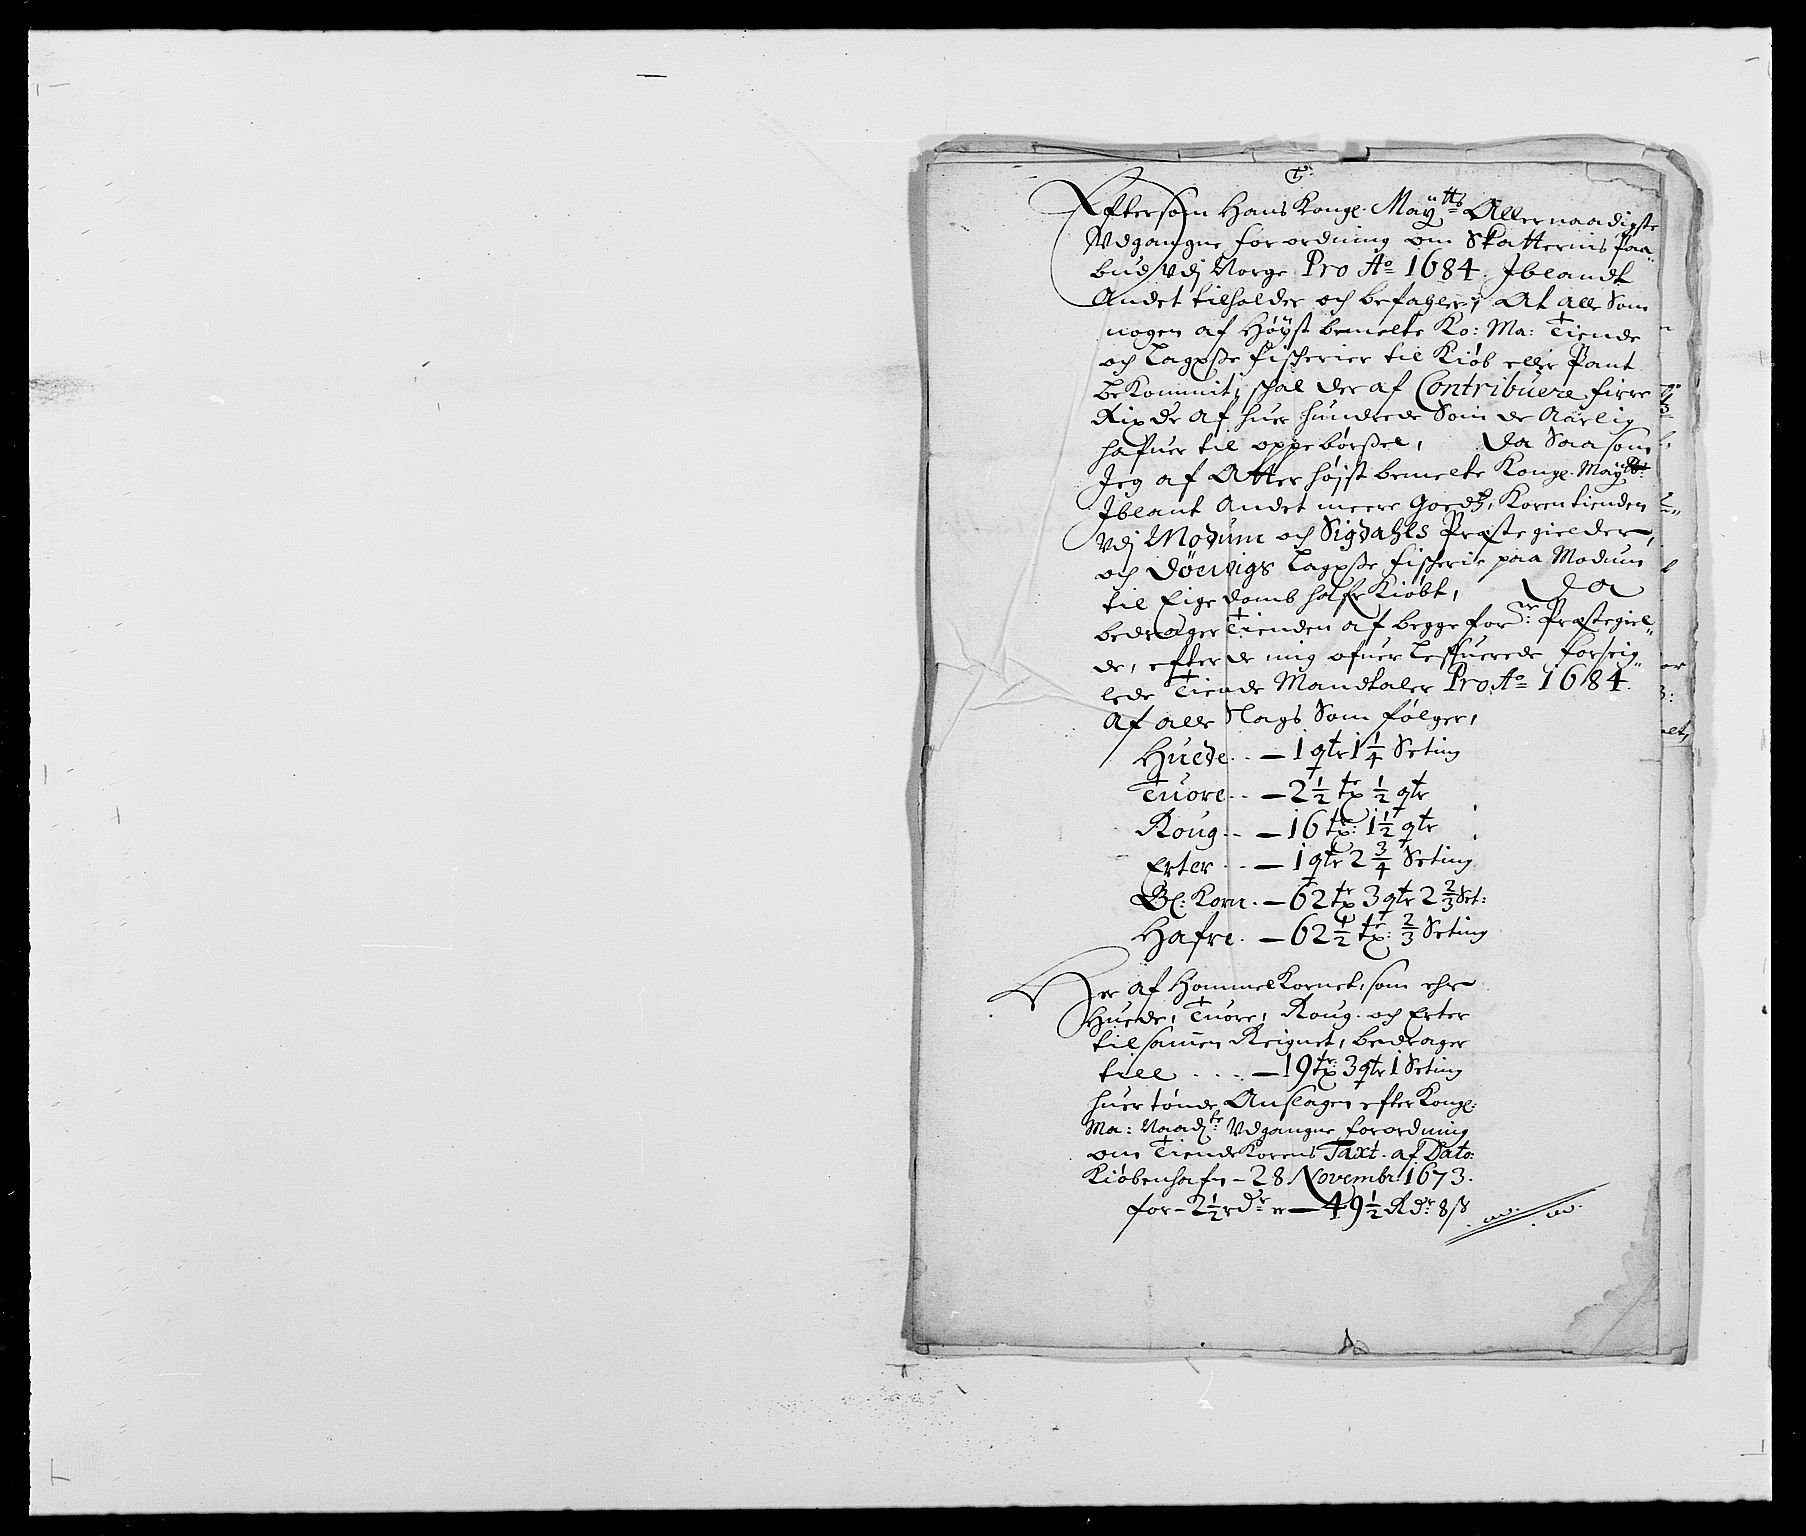 RA, Rentekammeret inntil 1814, Reviderte regnskaper, Fogderegnskap, R25/L1677: Fogderegnskap Buskerud, 1683-1684, s. 337